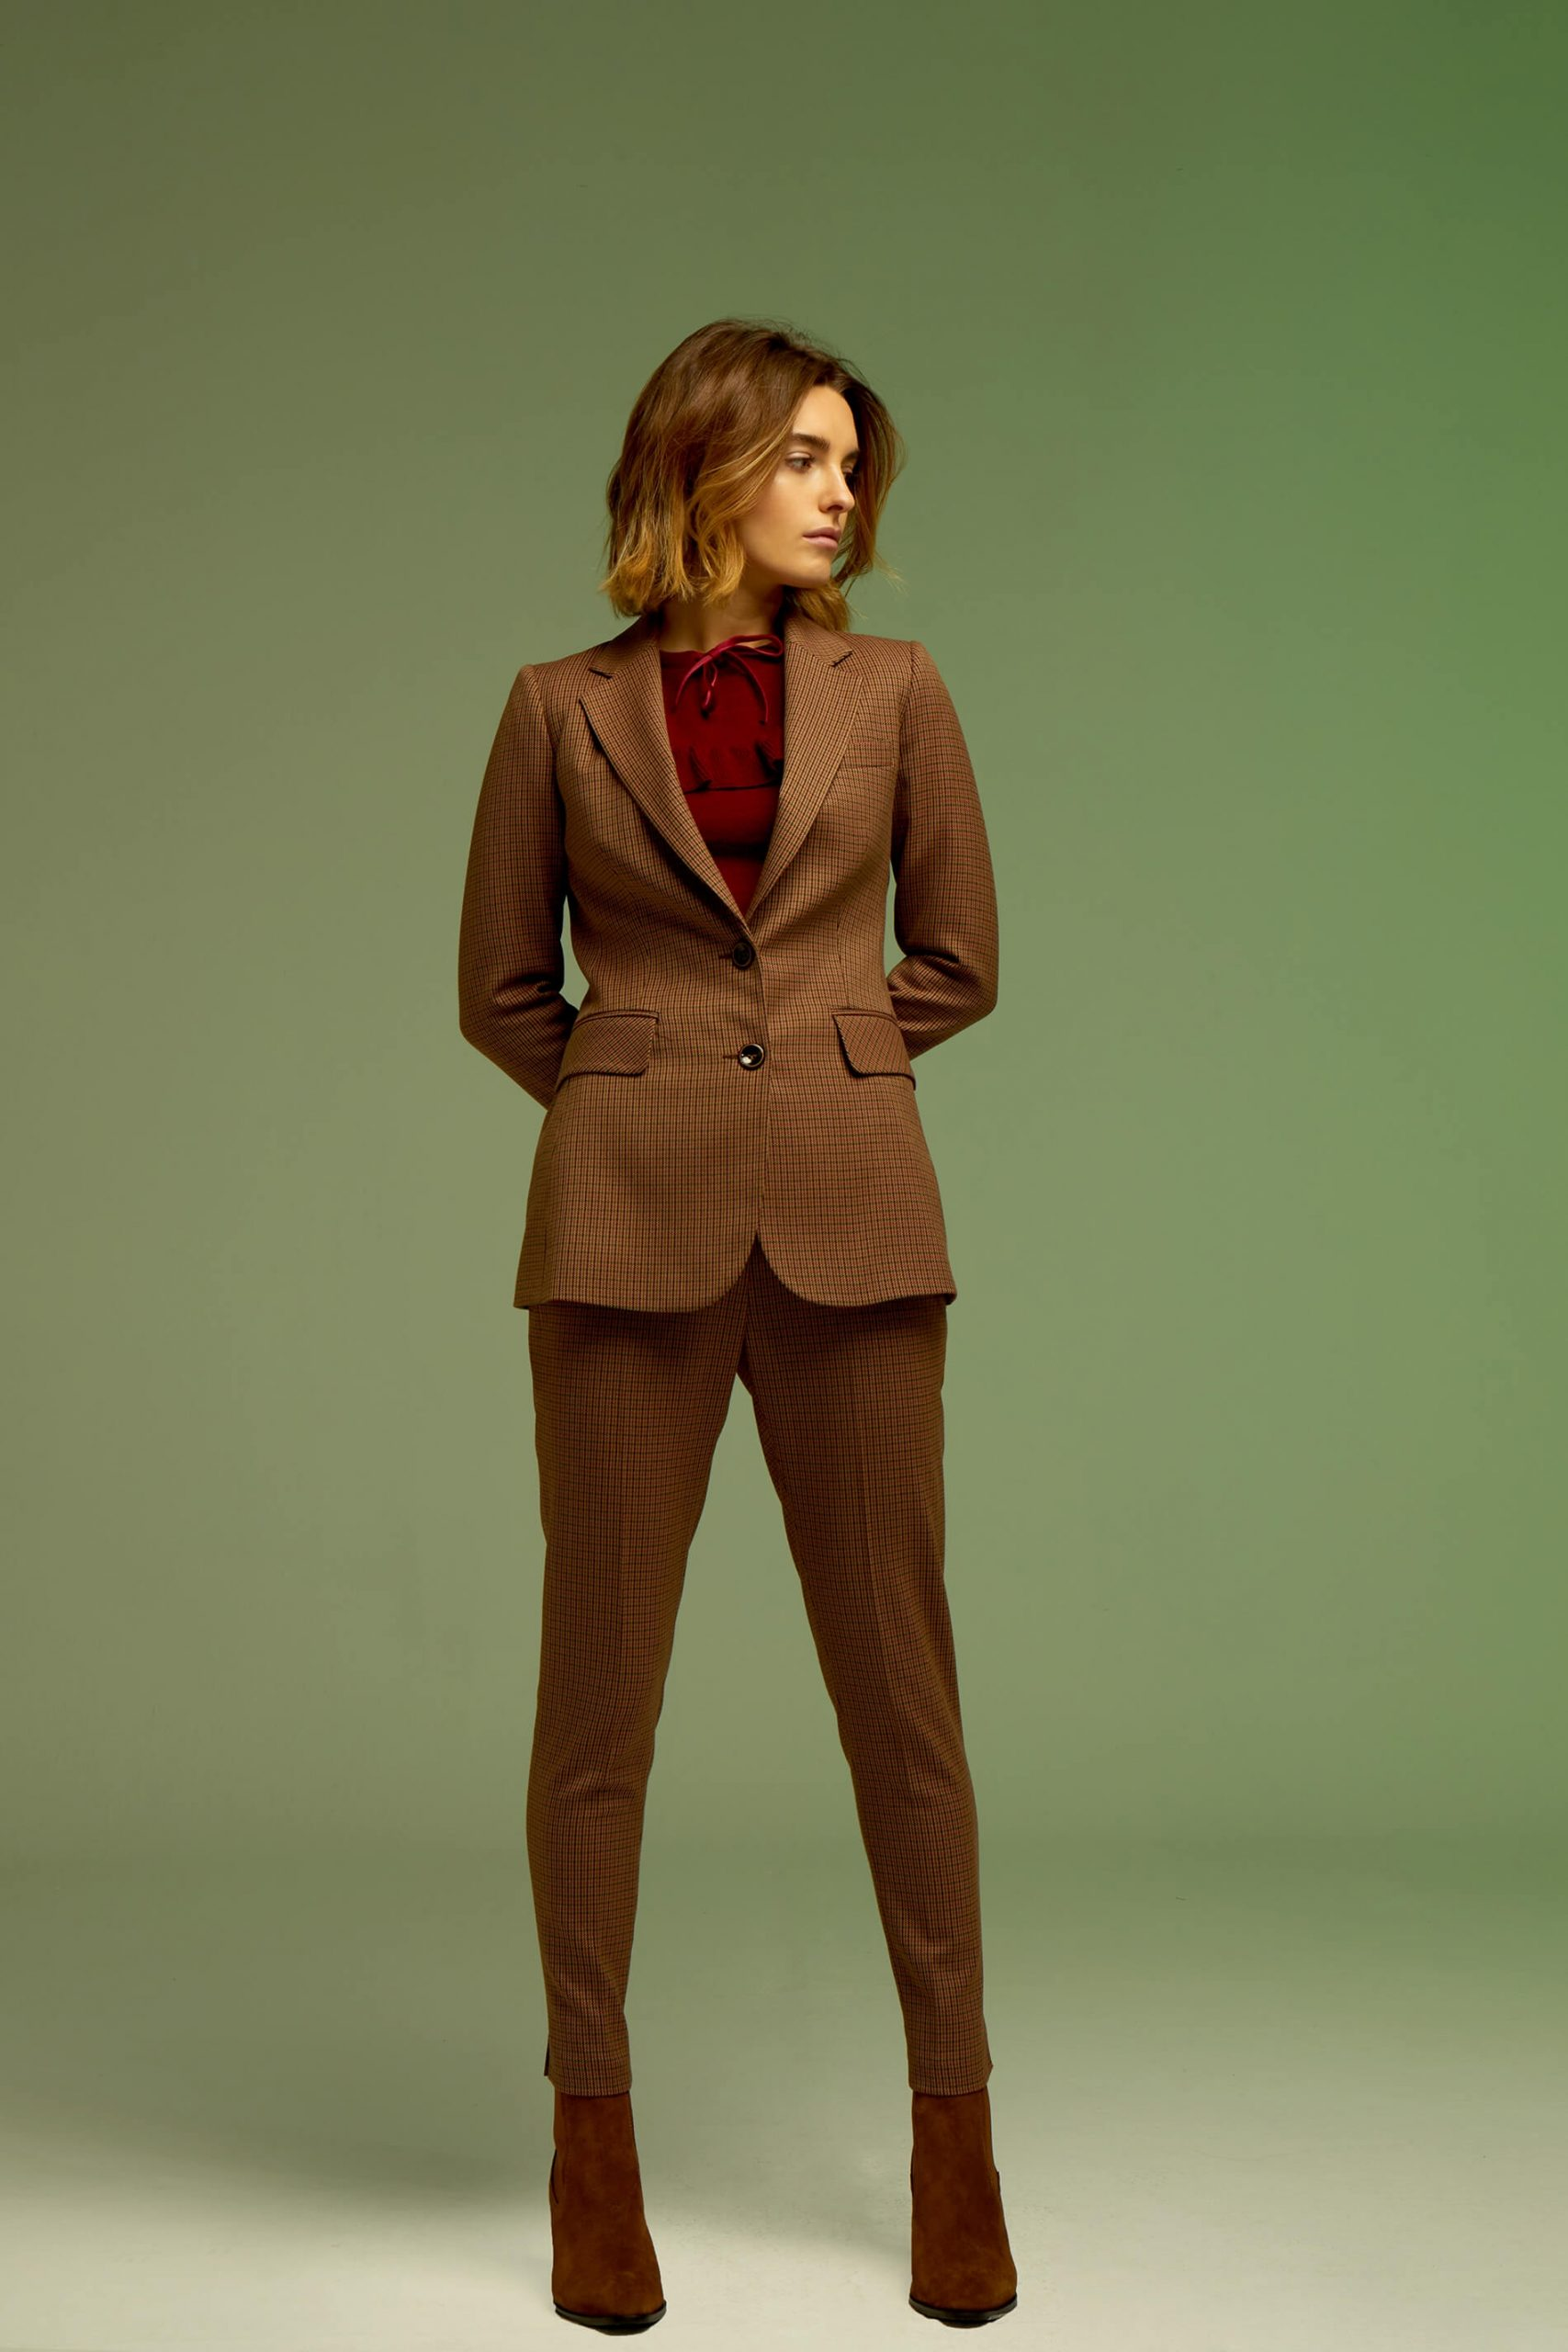 pantalon-tally-marron seven times andmeunlimited